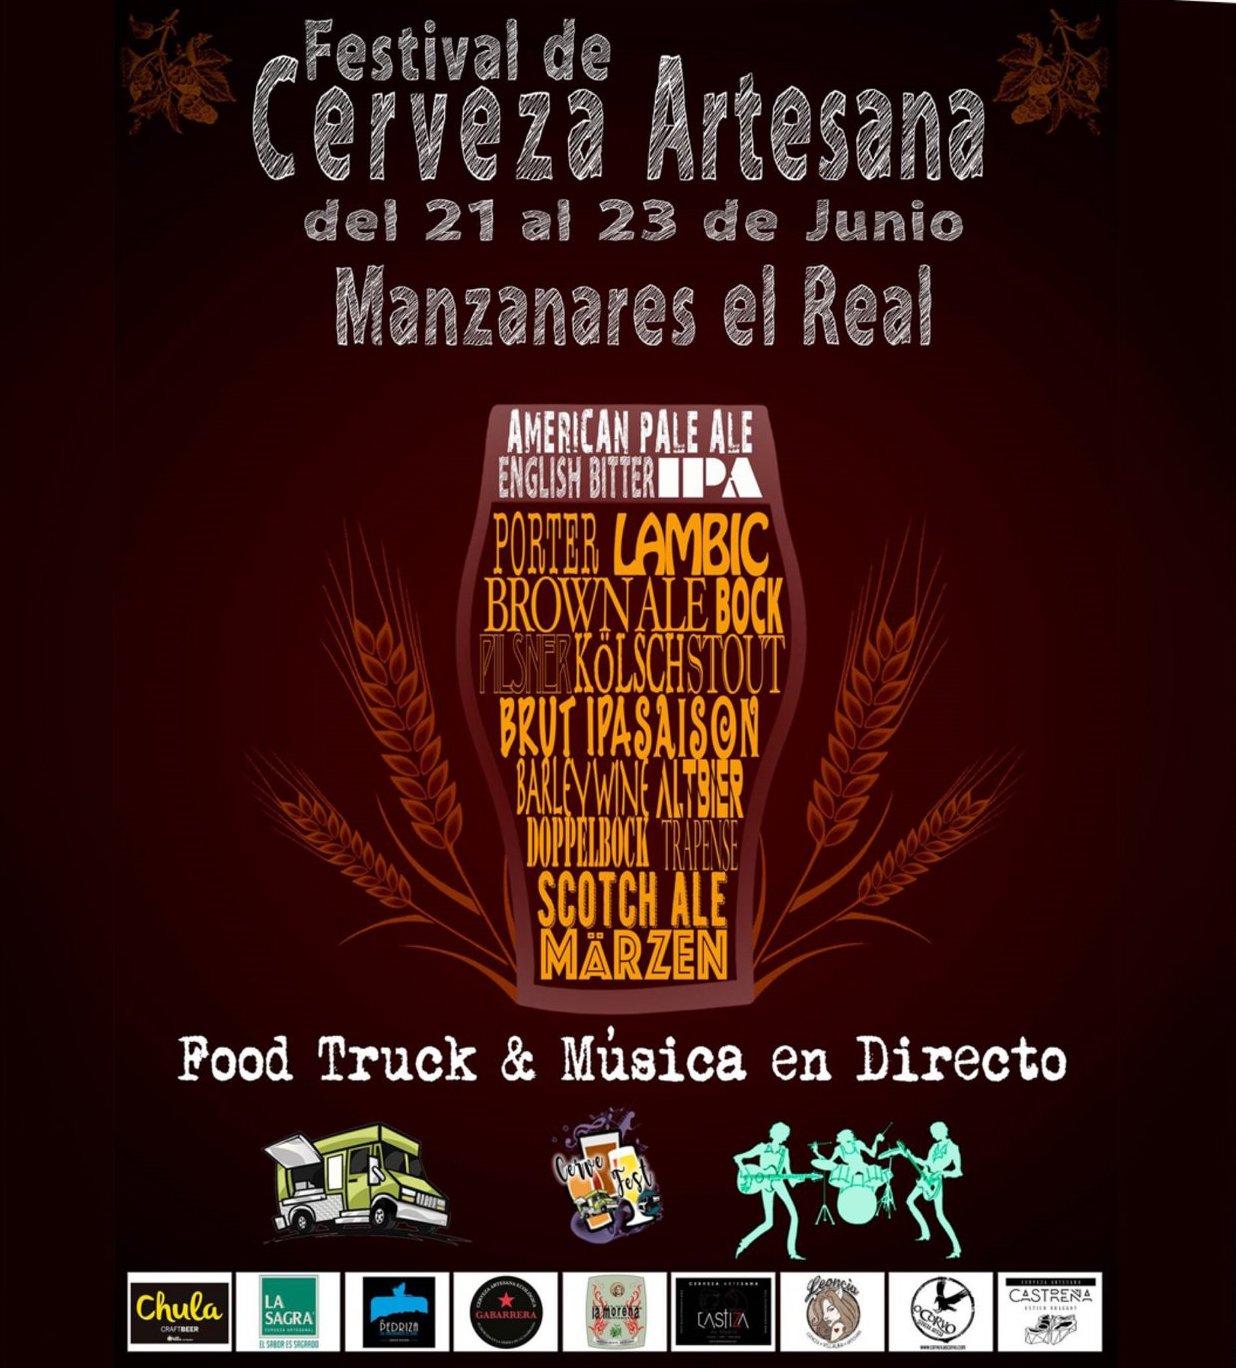 Festival de Cerveza Artesana de Manzanares El Real 2019